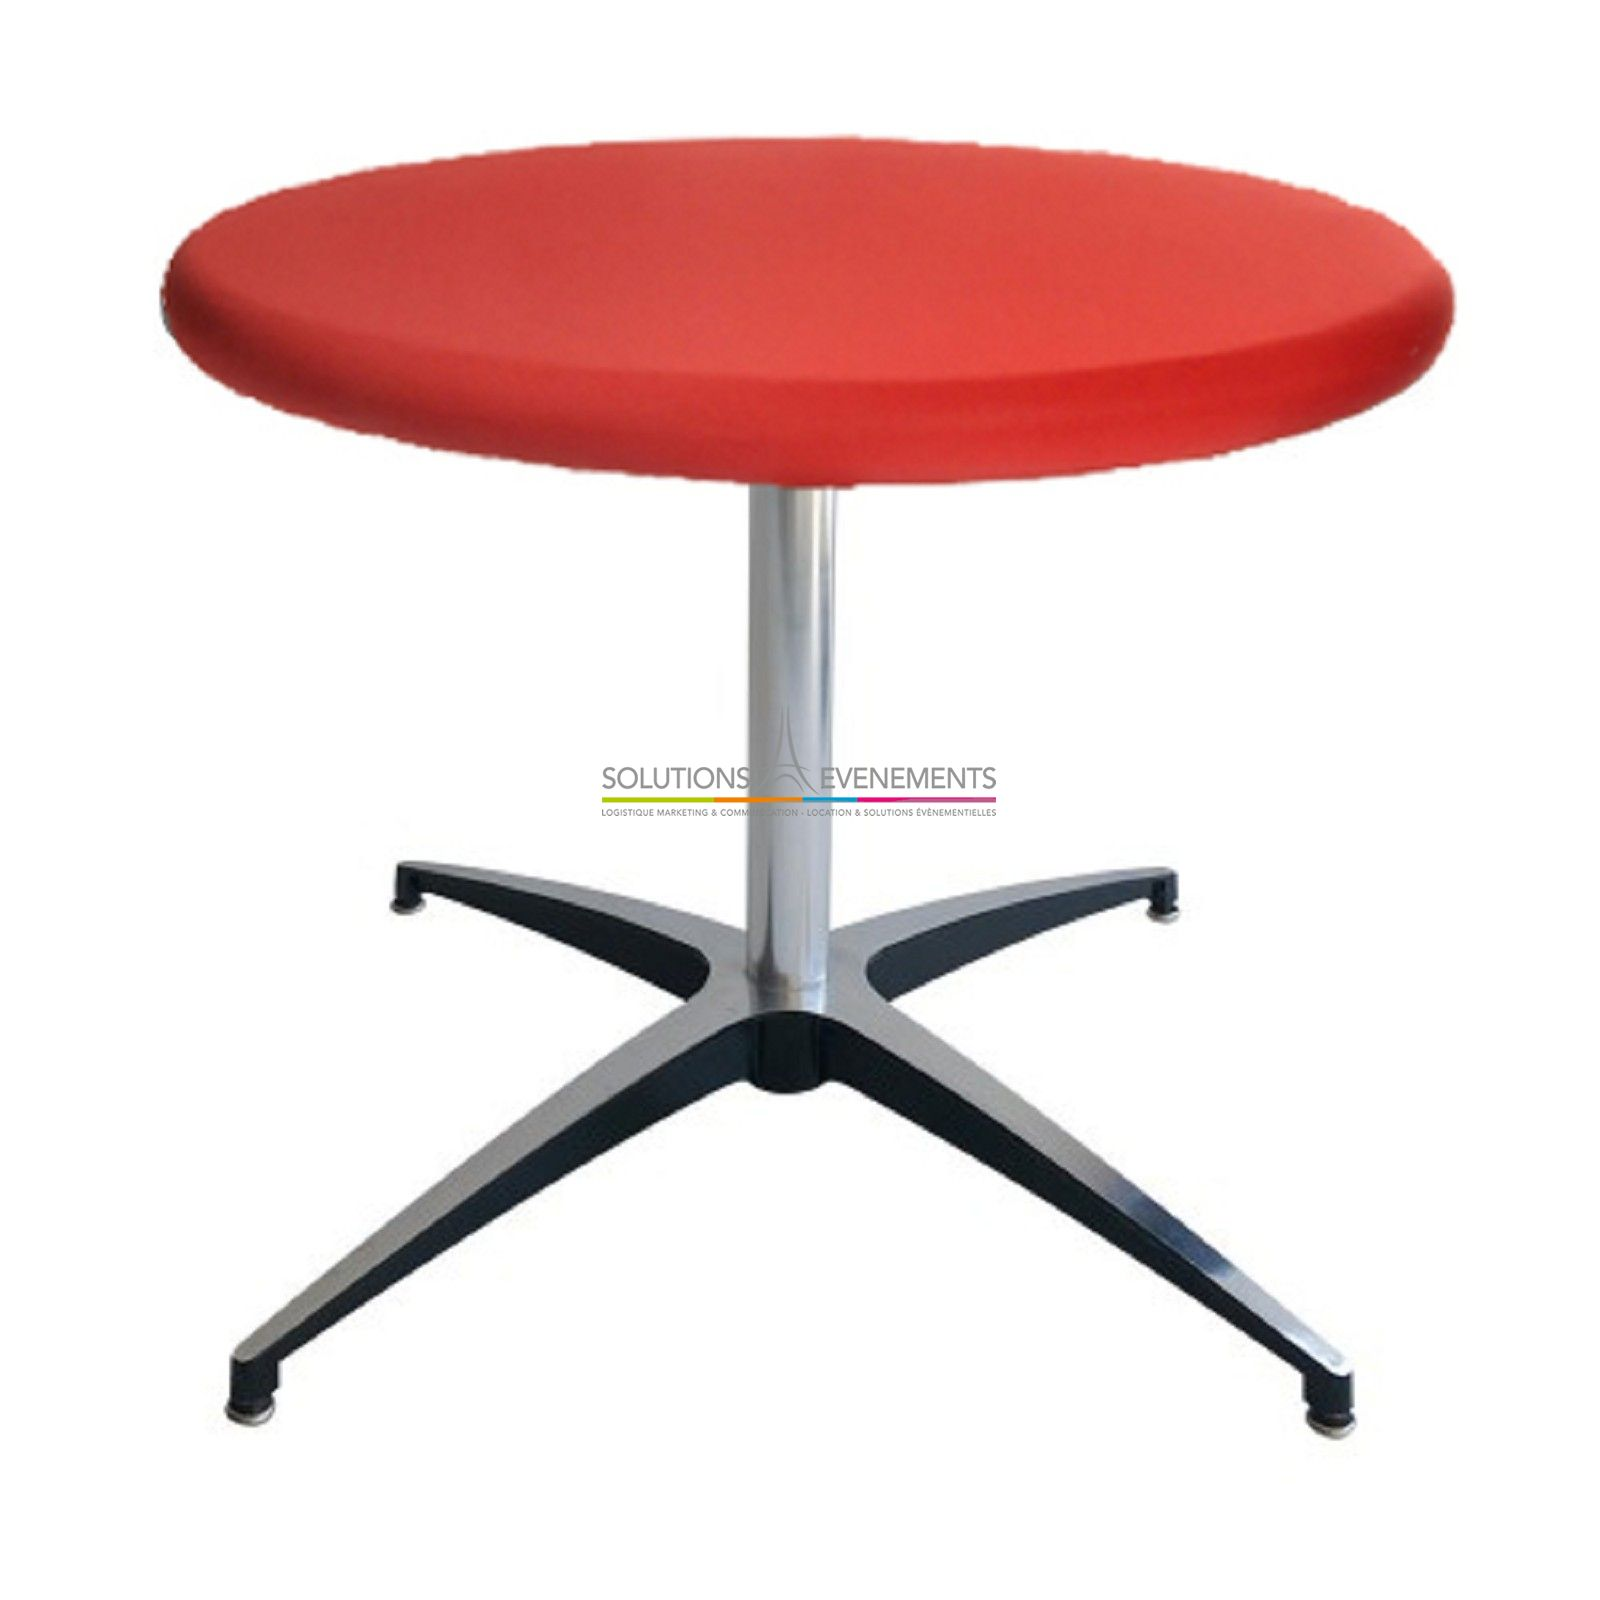 location table basse rouge solutions evenements. Black Bedroom Furniture Sets. Home Design Ideas